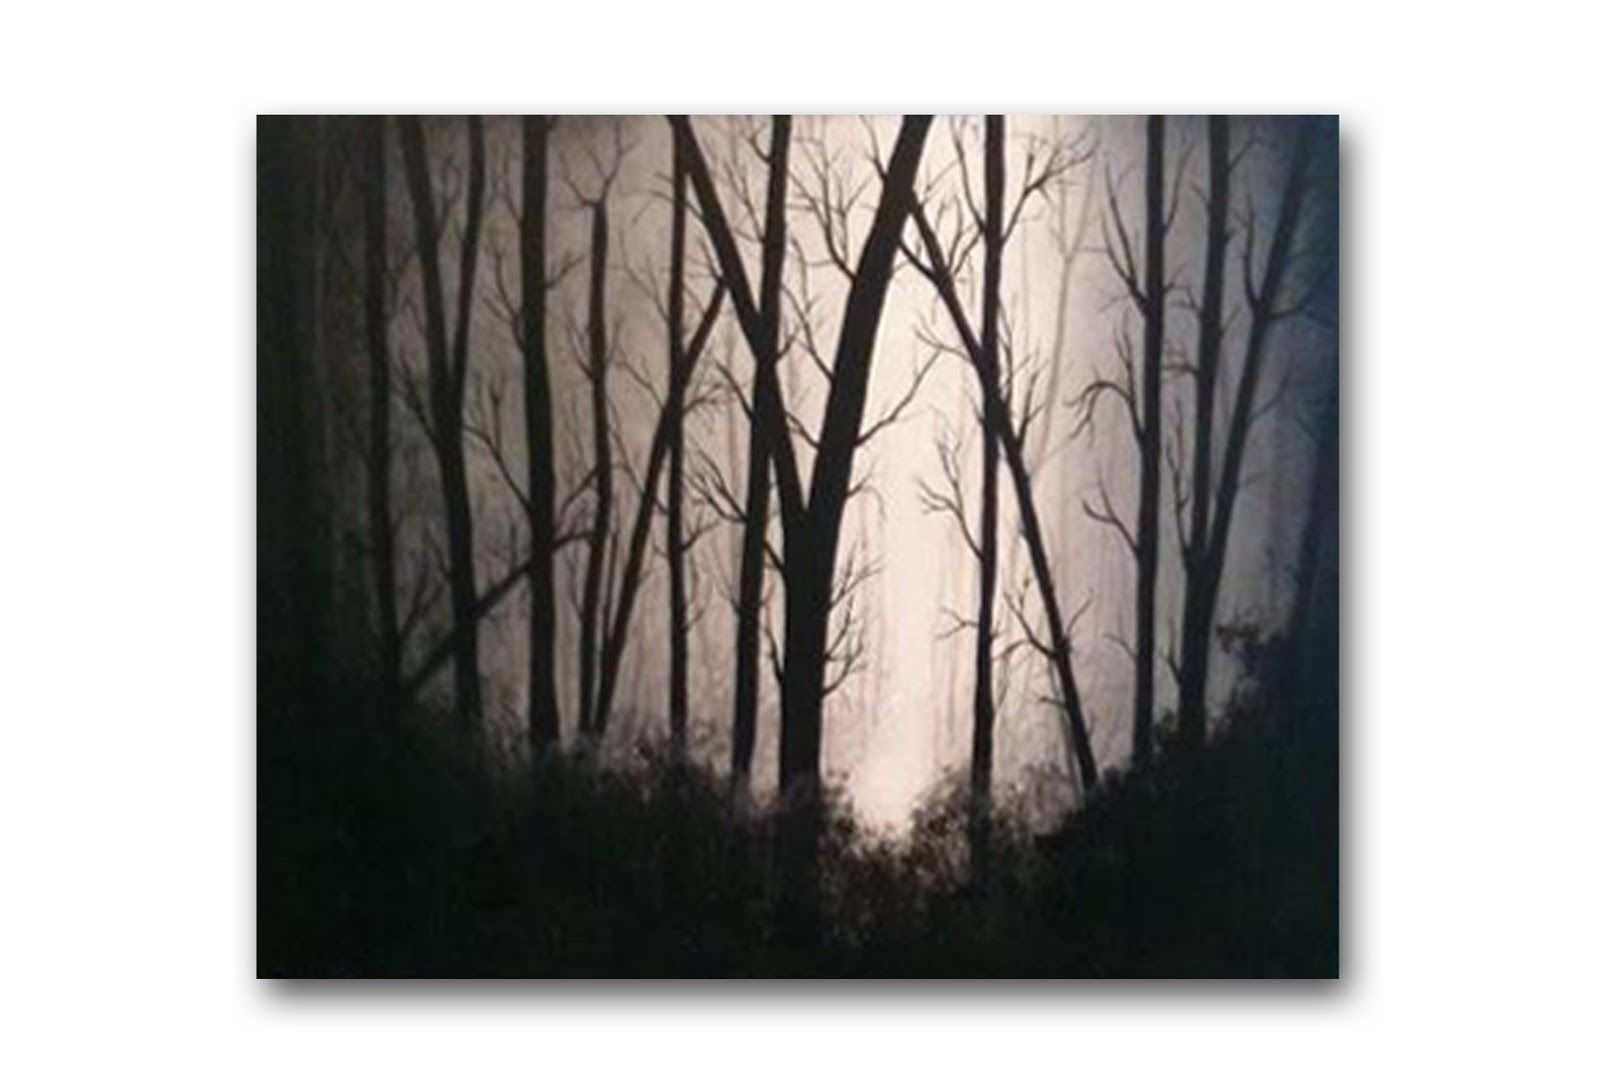 Julia Baldwin Graphic Designer Photographer A Few Of My Latest Paintings Series